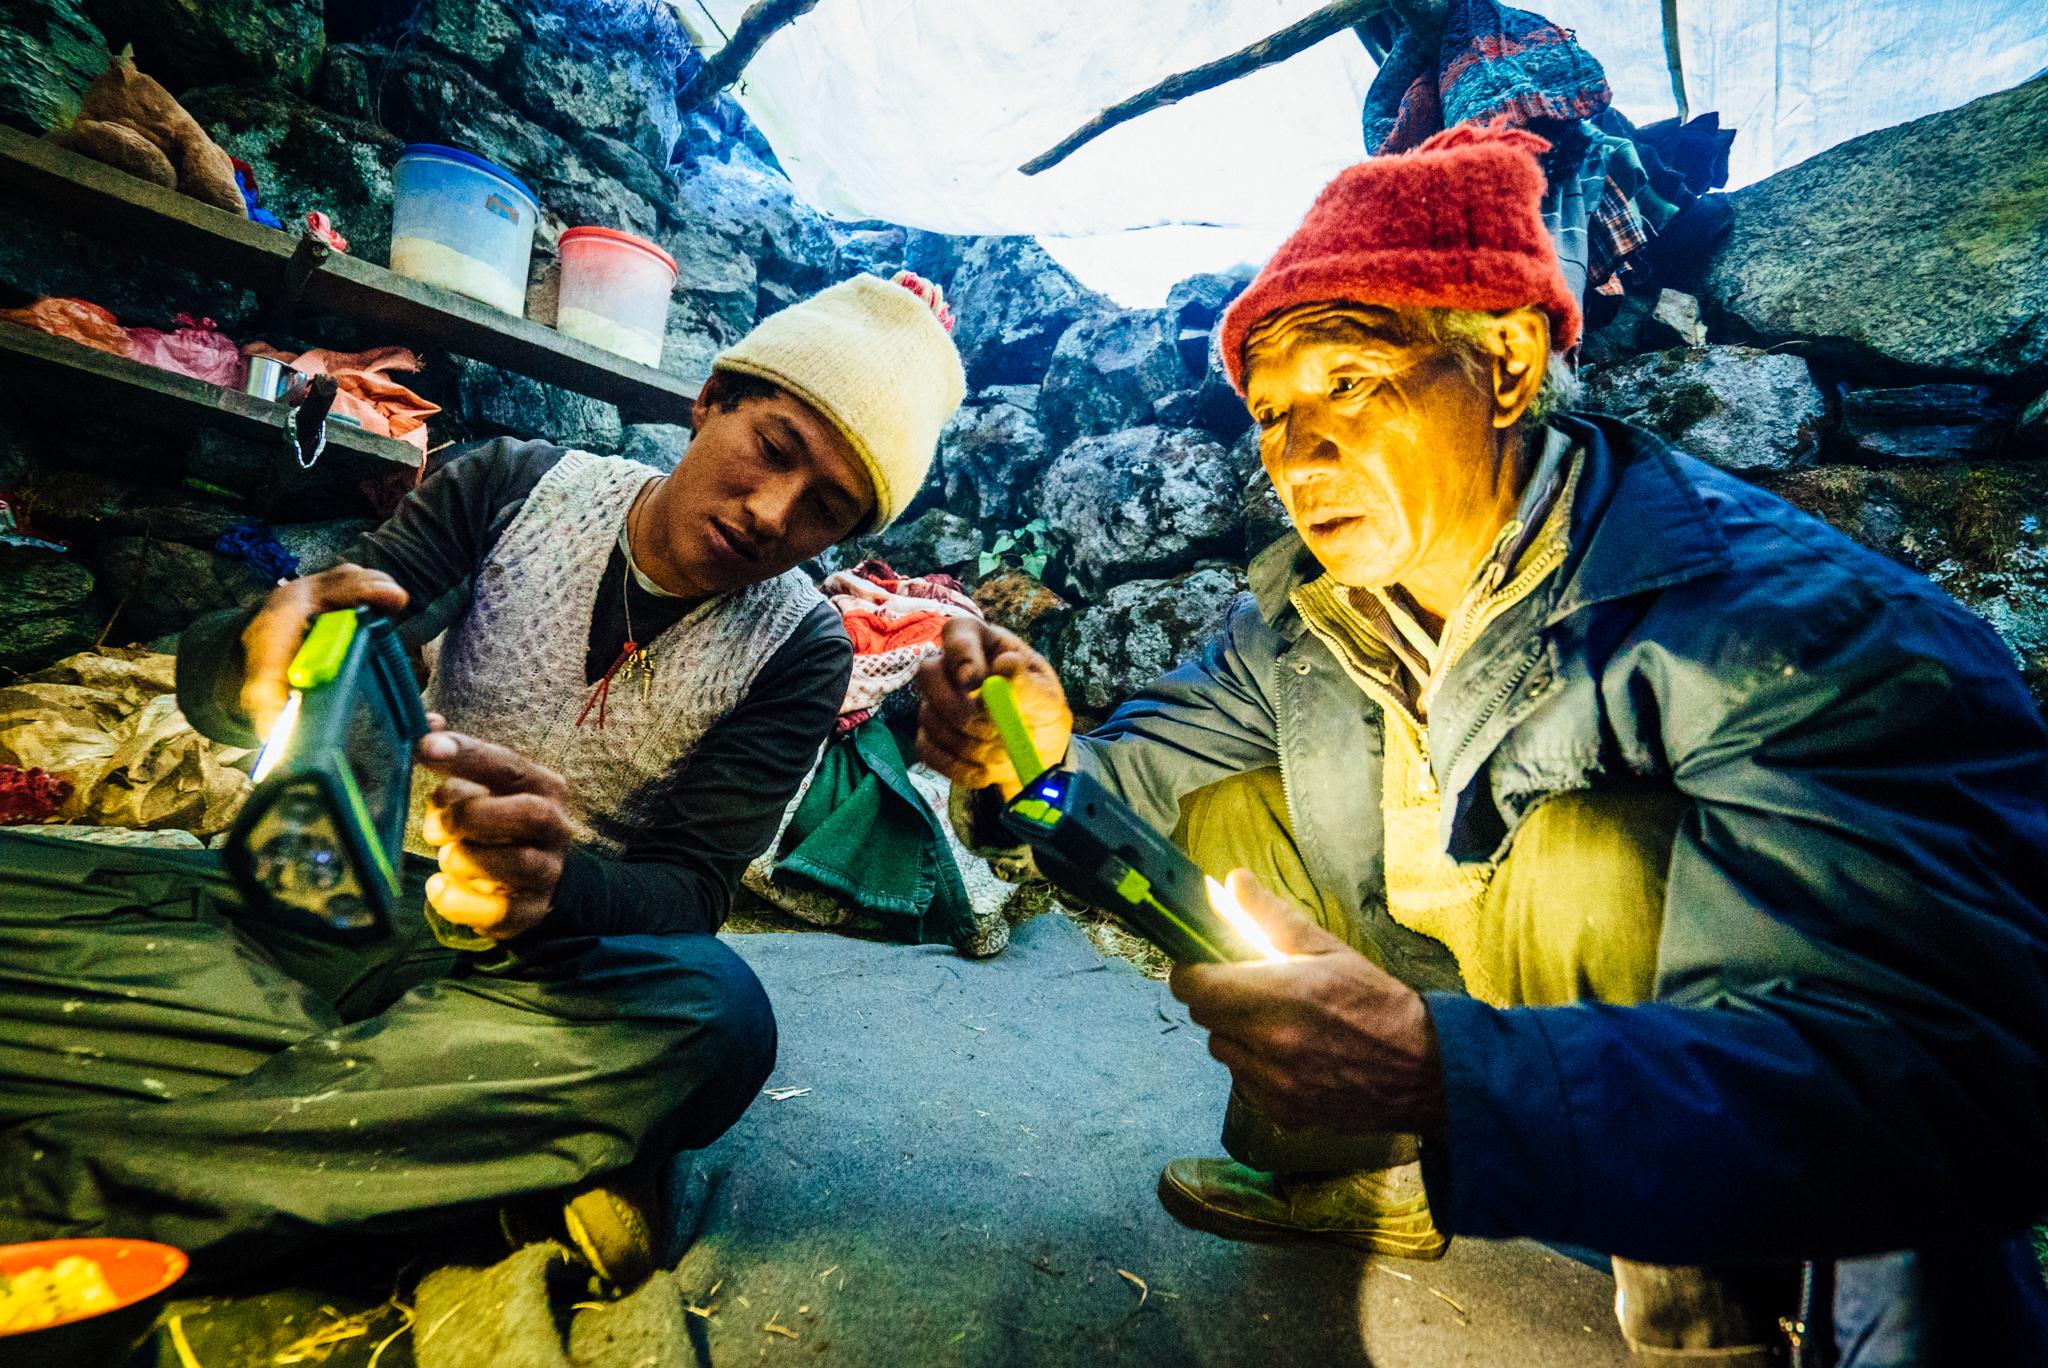 Langtang-Nepal-A7S-NOV15-23.jpg